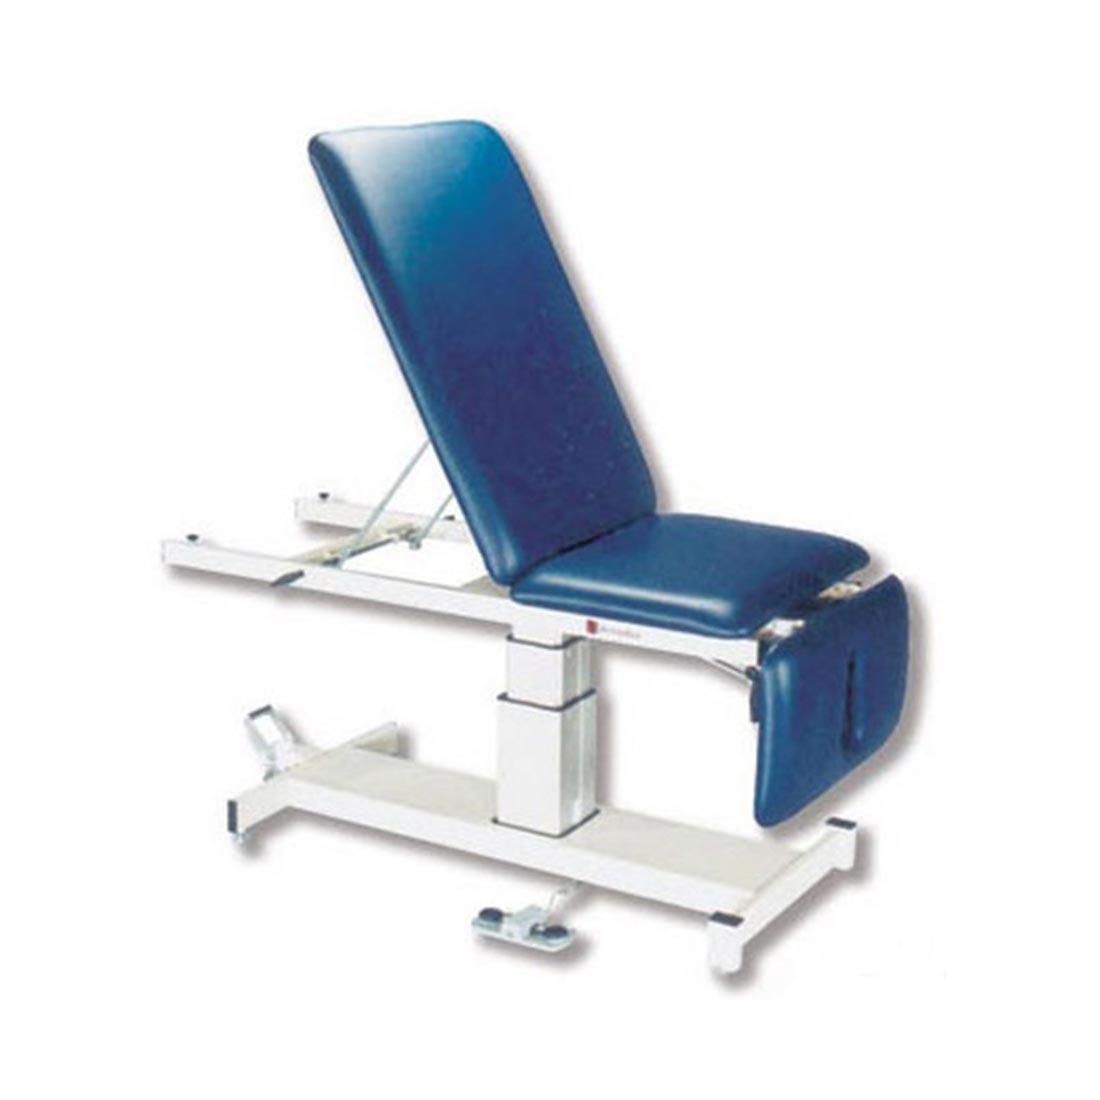 Armedica AM-SP 350 treatment table